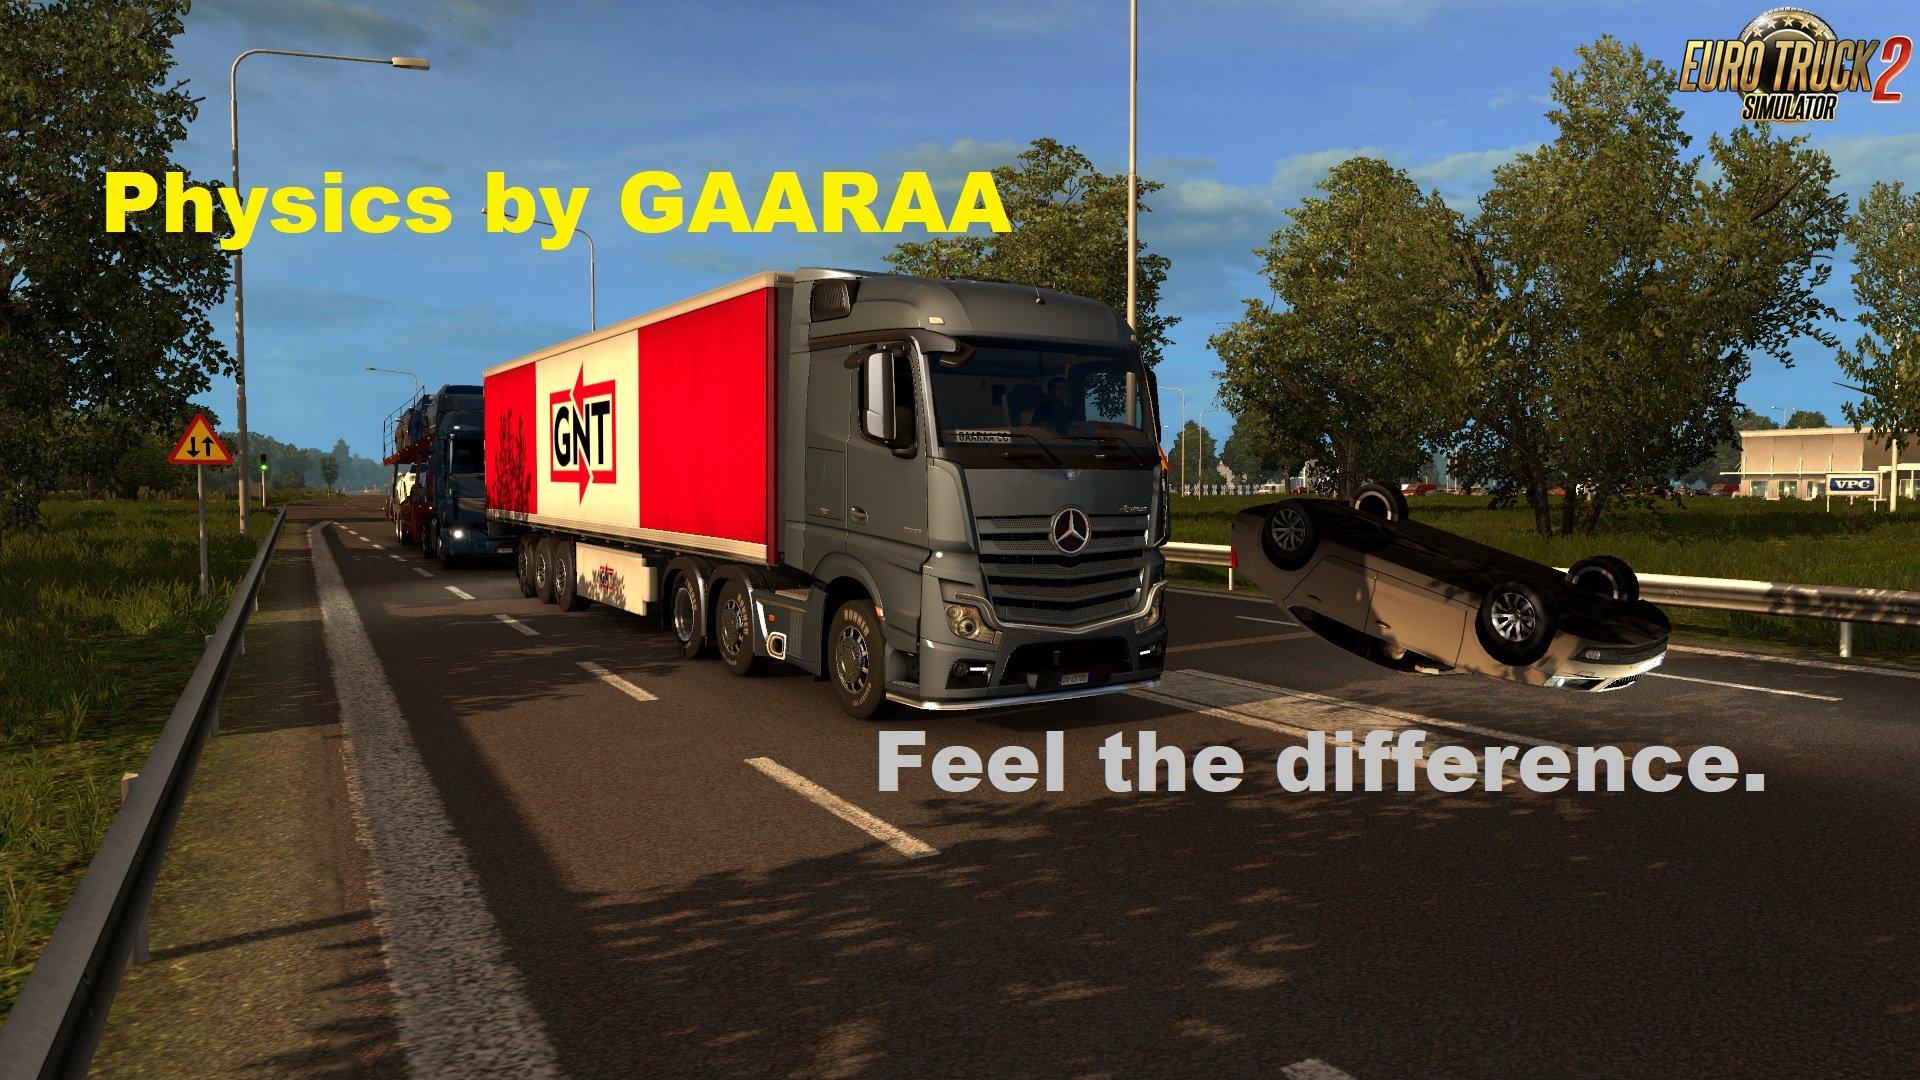 Physics by GAARAA